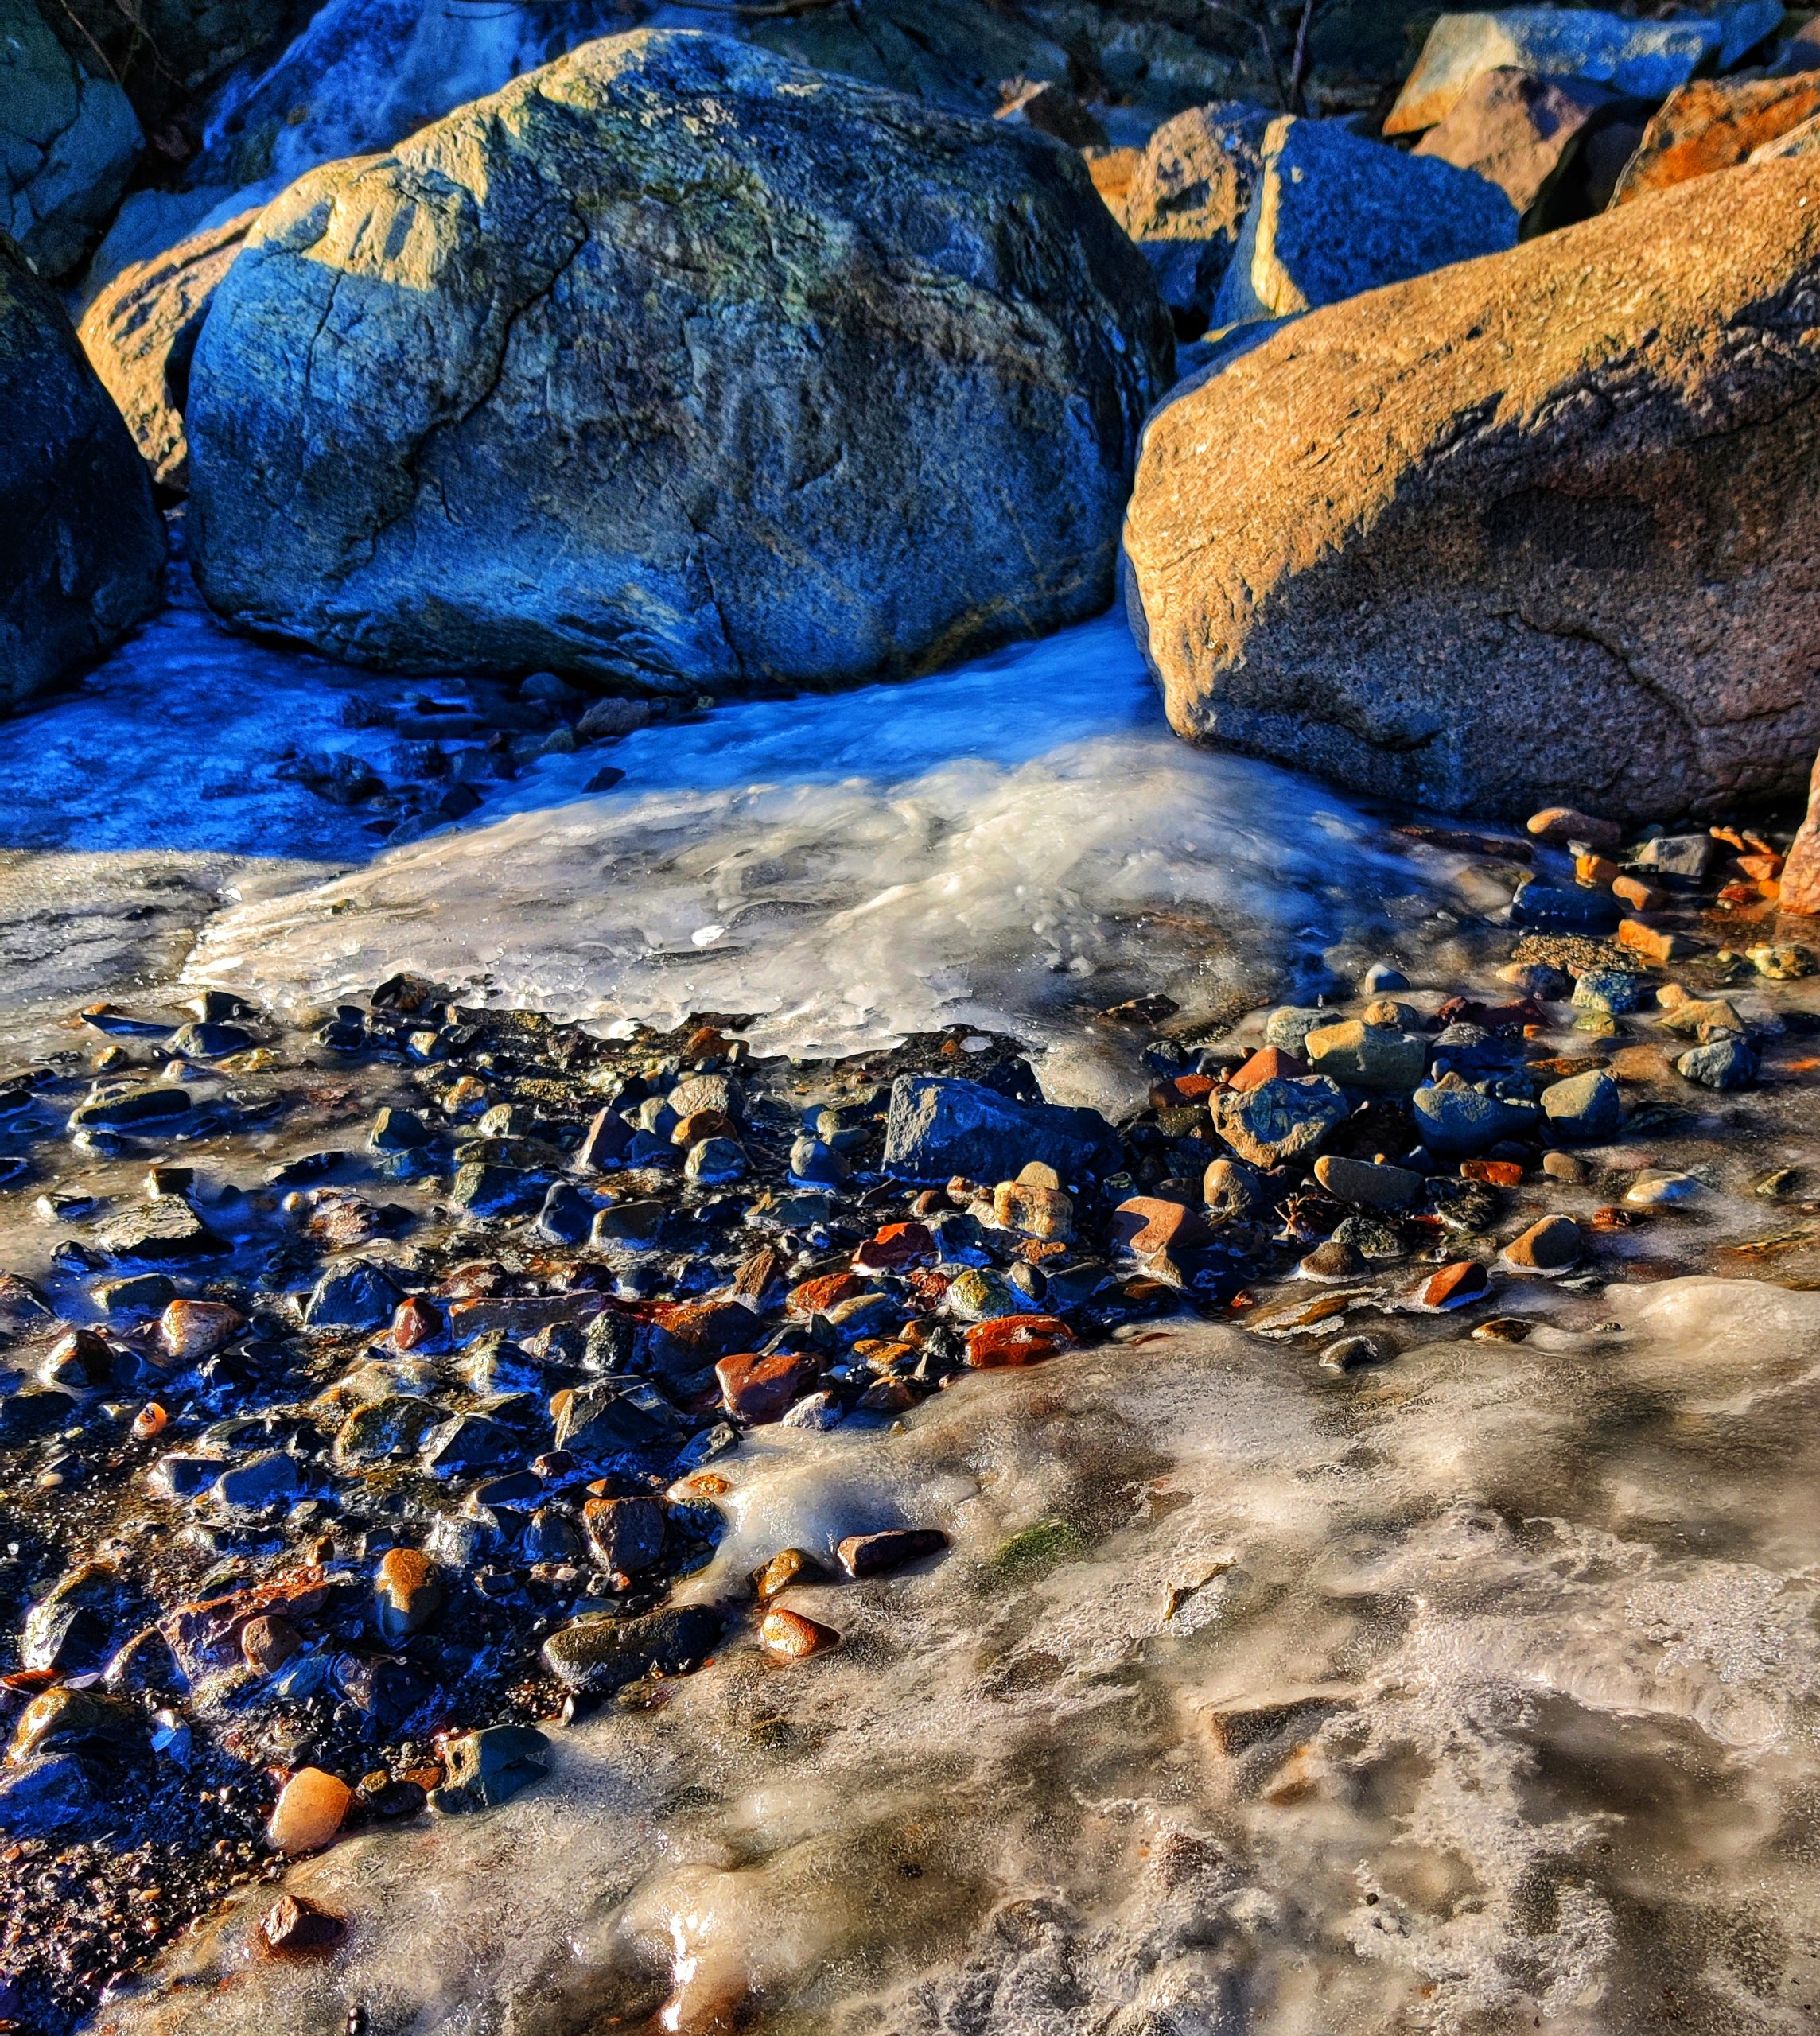 Melting ice on the shore